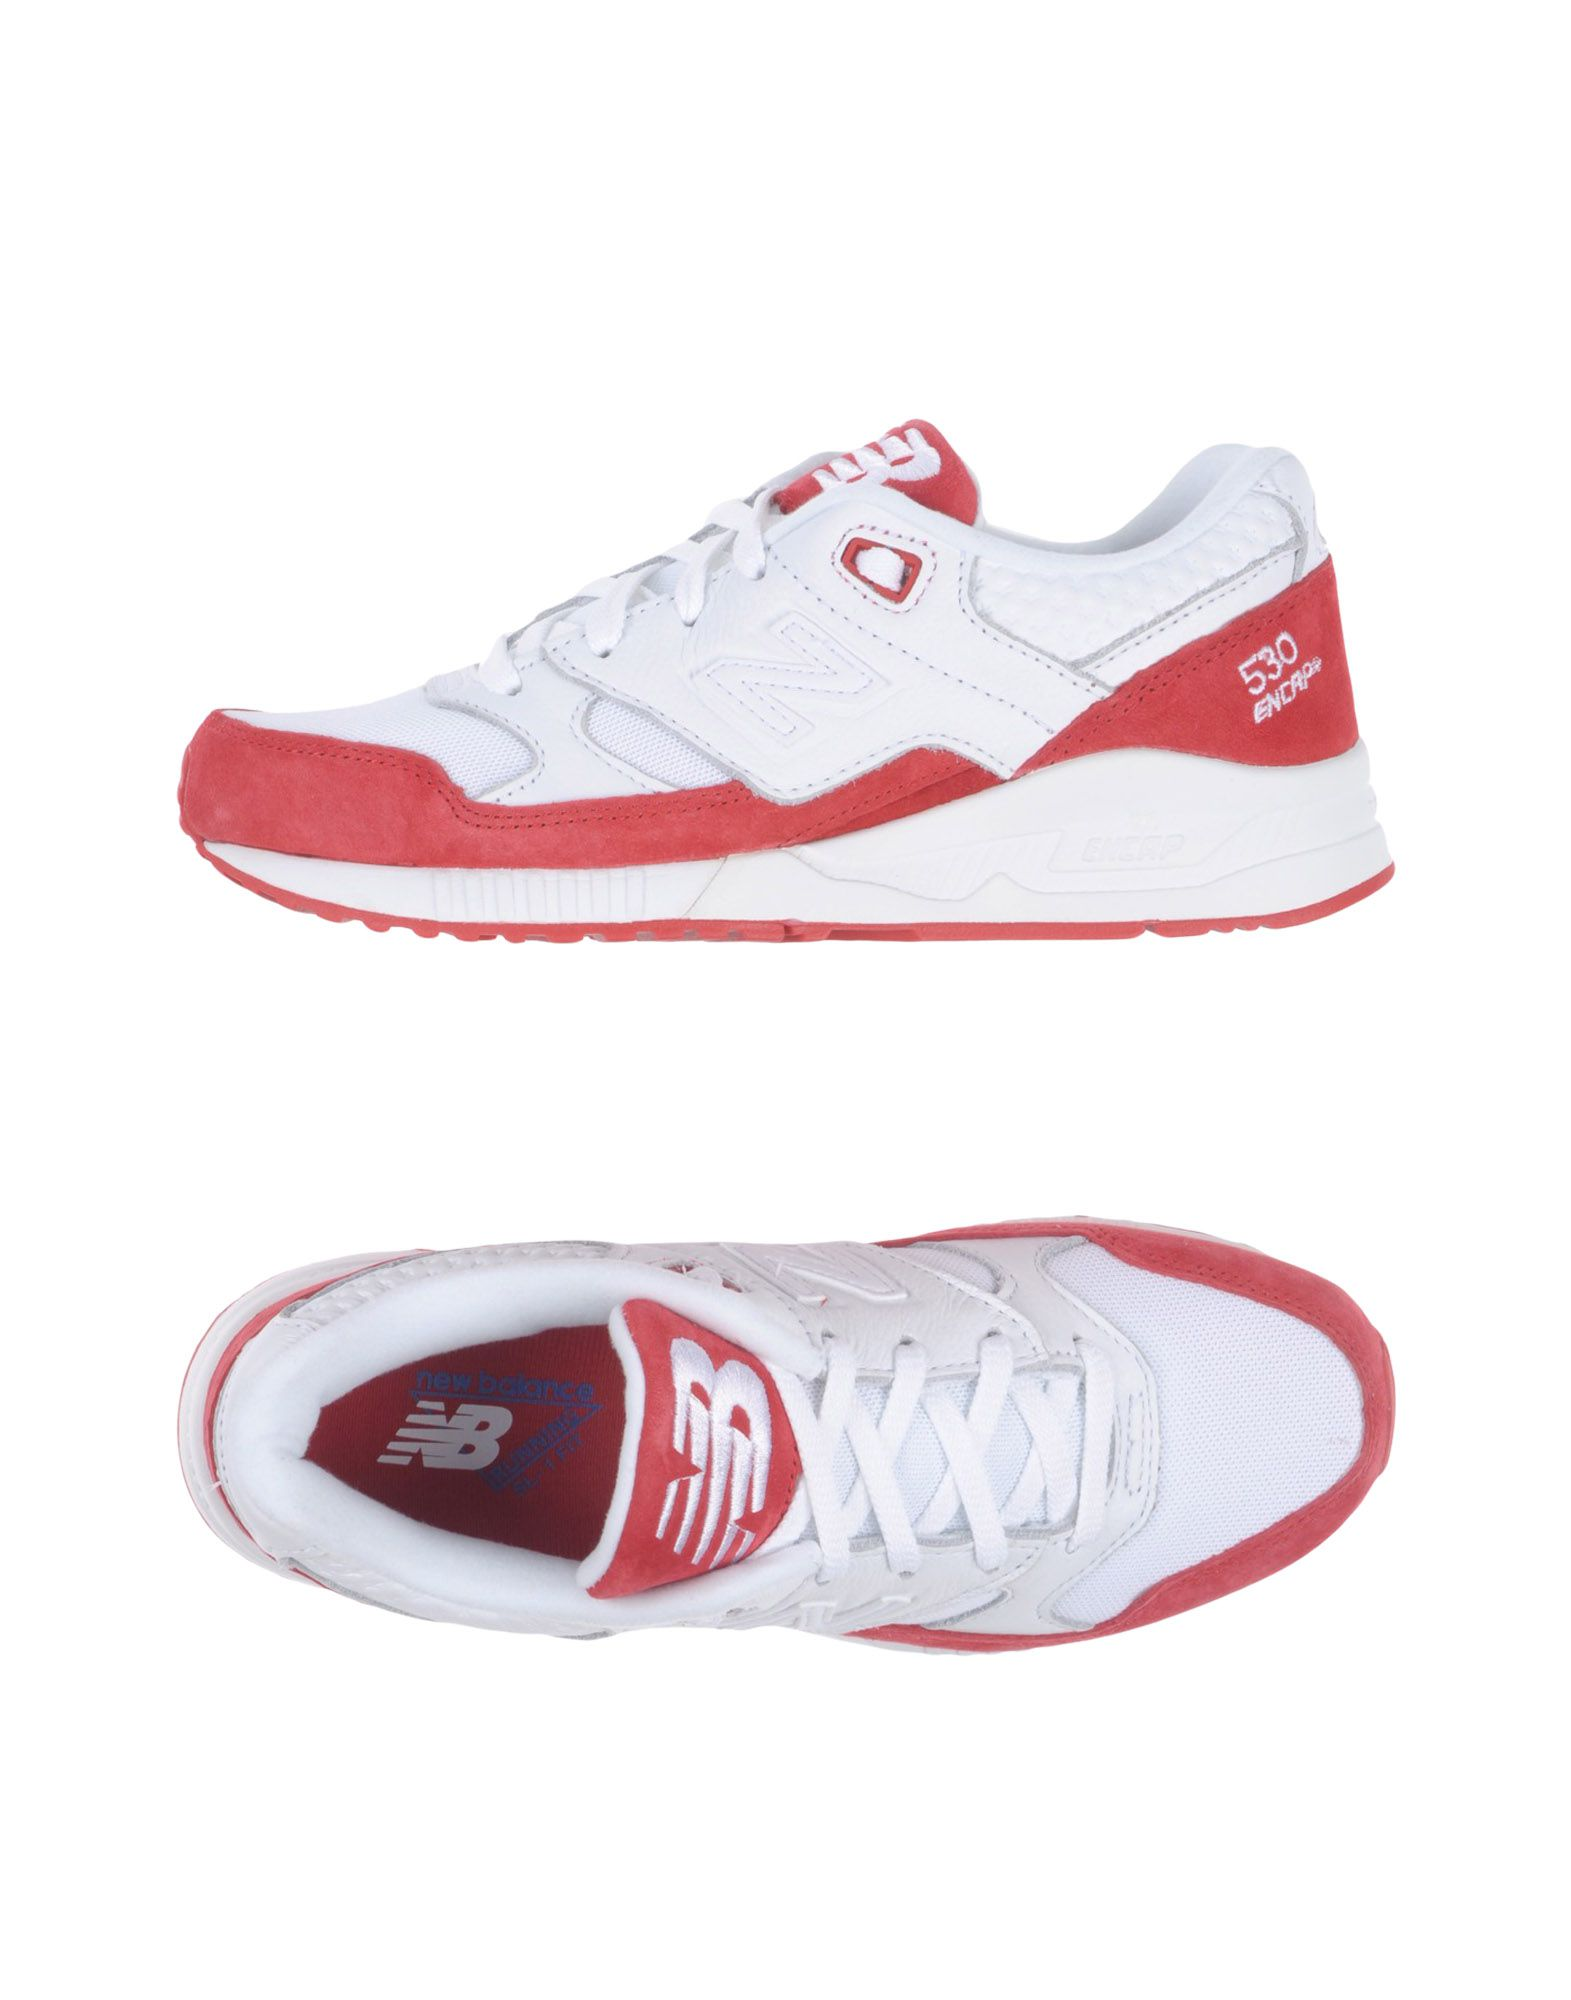 New 11387632AB Balance Sneakers Damen  11387632AB New  1cd3e7